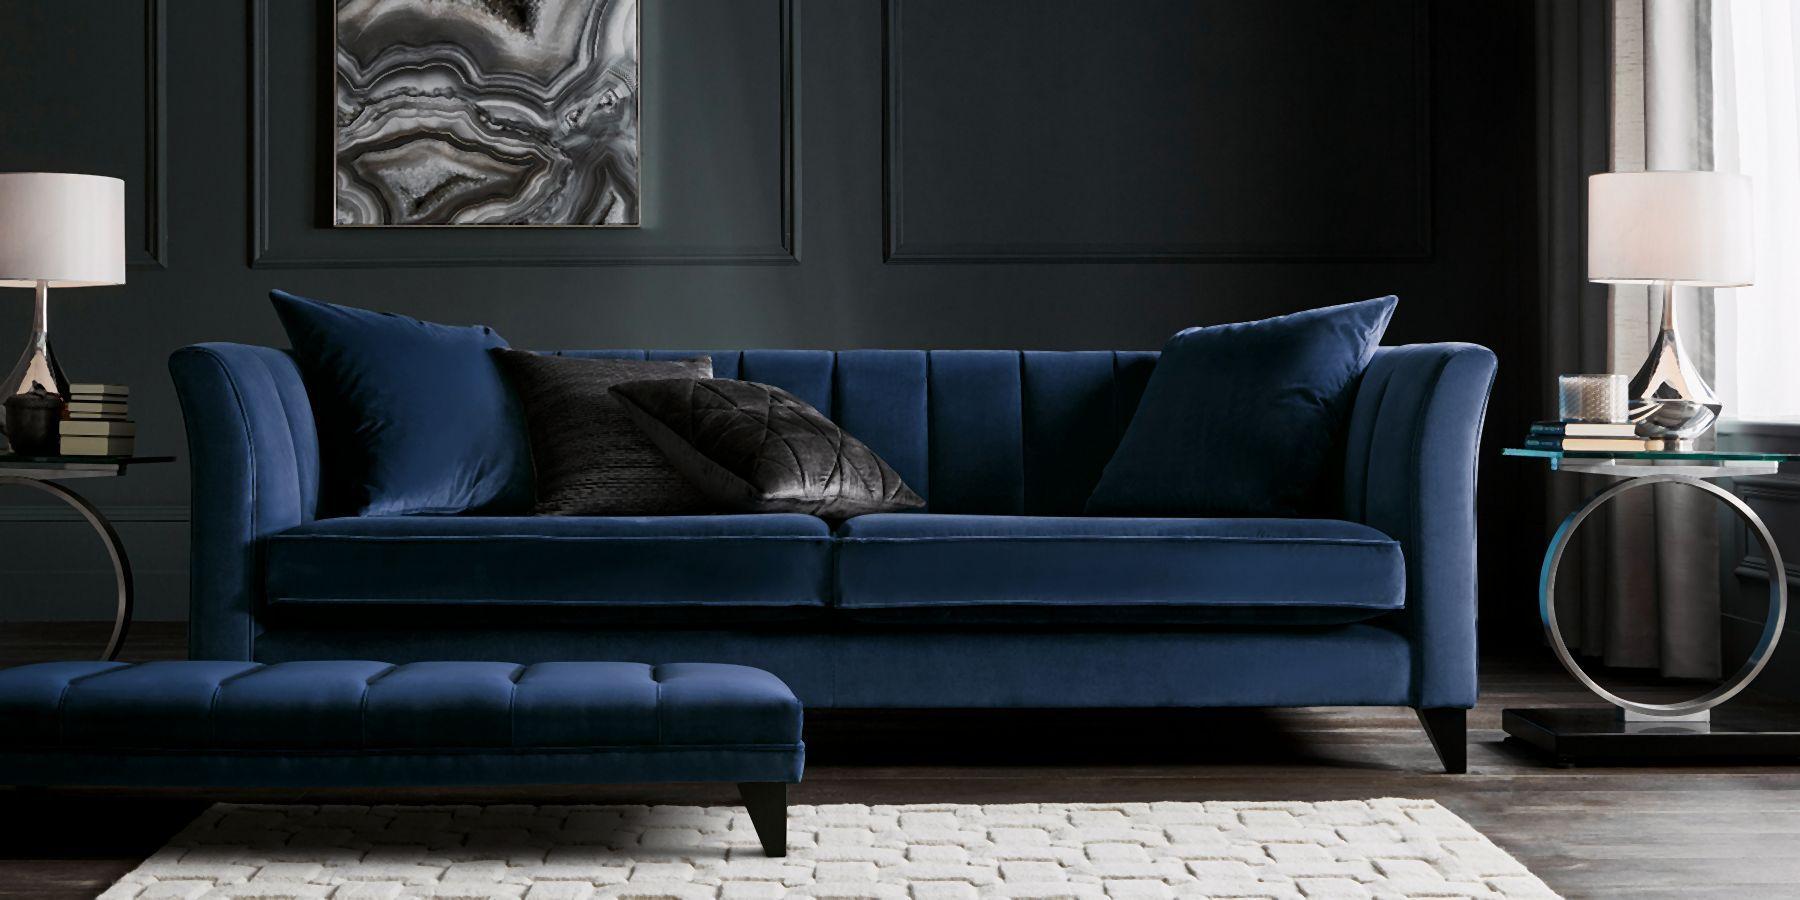 Next Gatsby Four Seater Sofa In Admiral Blue Velvet Sofa Sofa Next Blue Sofa